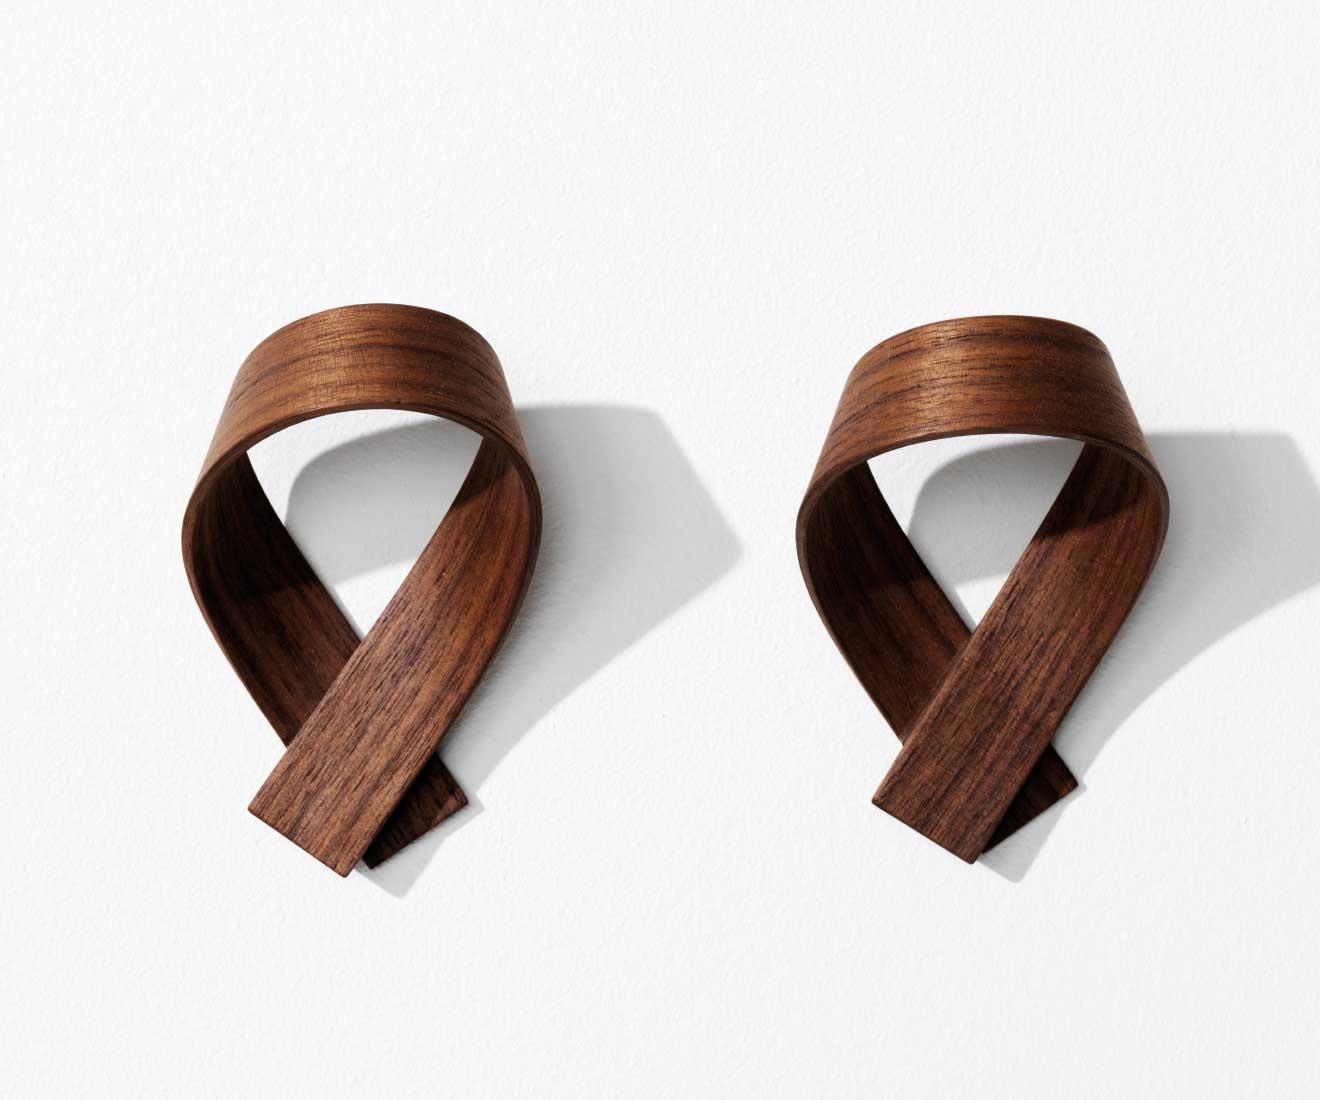 Motarasu Products - Ribbon coat hooks by Akiko Ken Made - Walnut